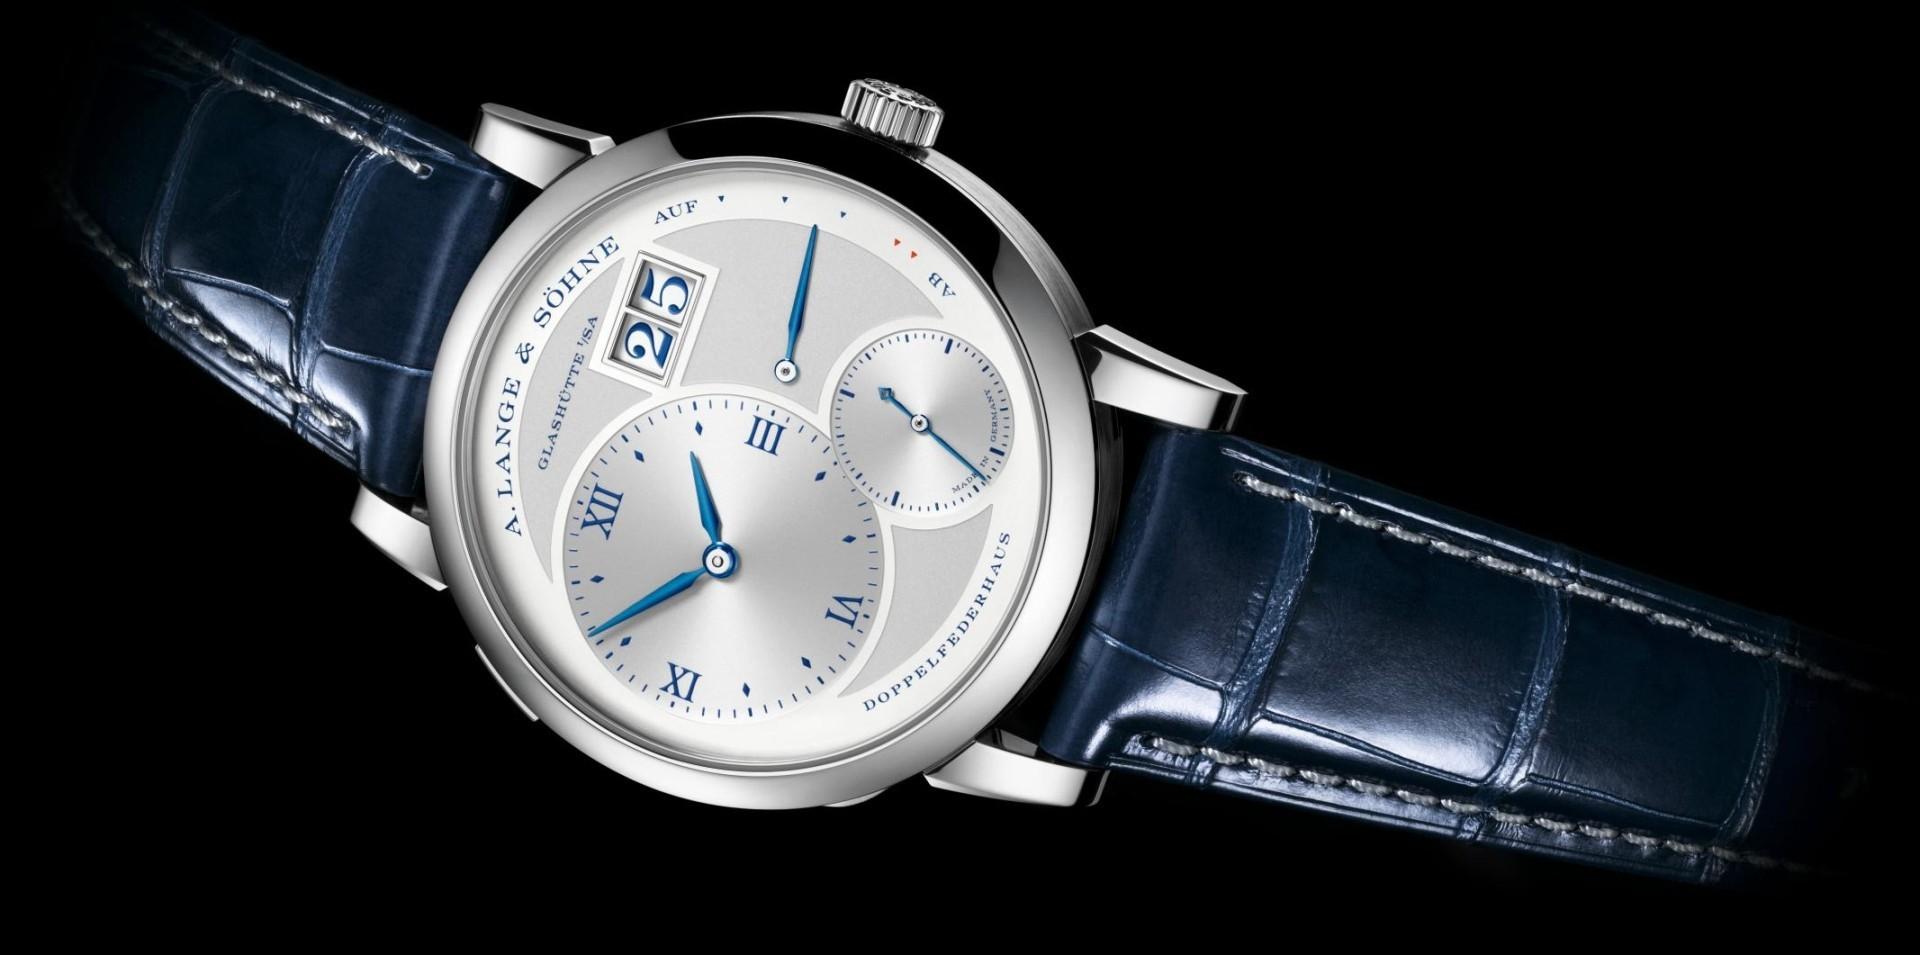 【SIHH 2019錶展報導】朗格為最著名錶款推出週年紀念版—Lange 1 25th Anniversary